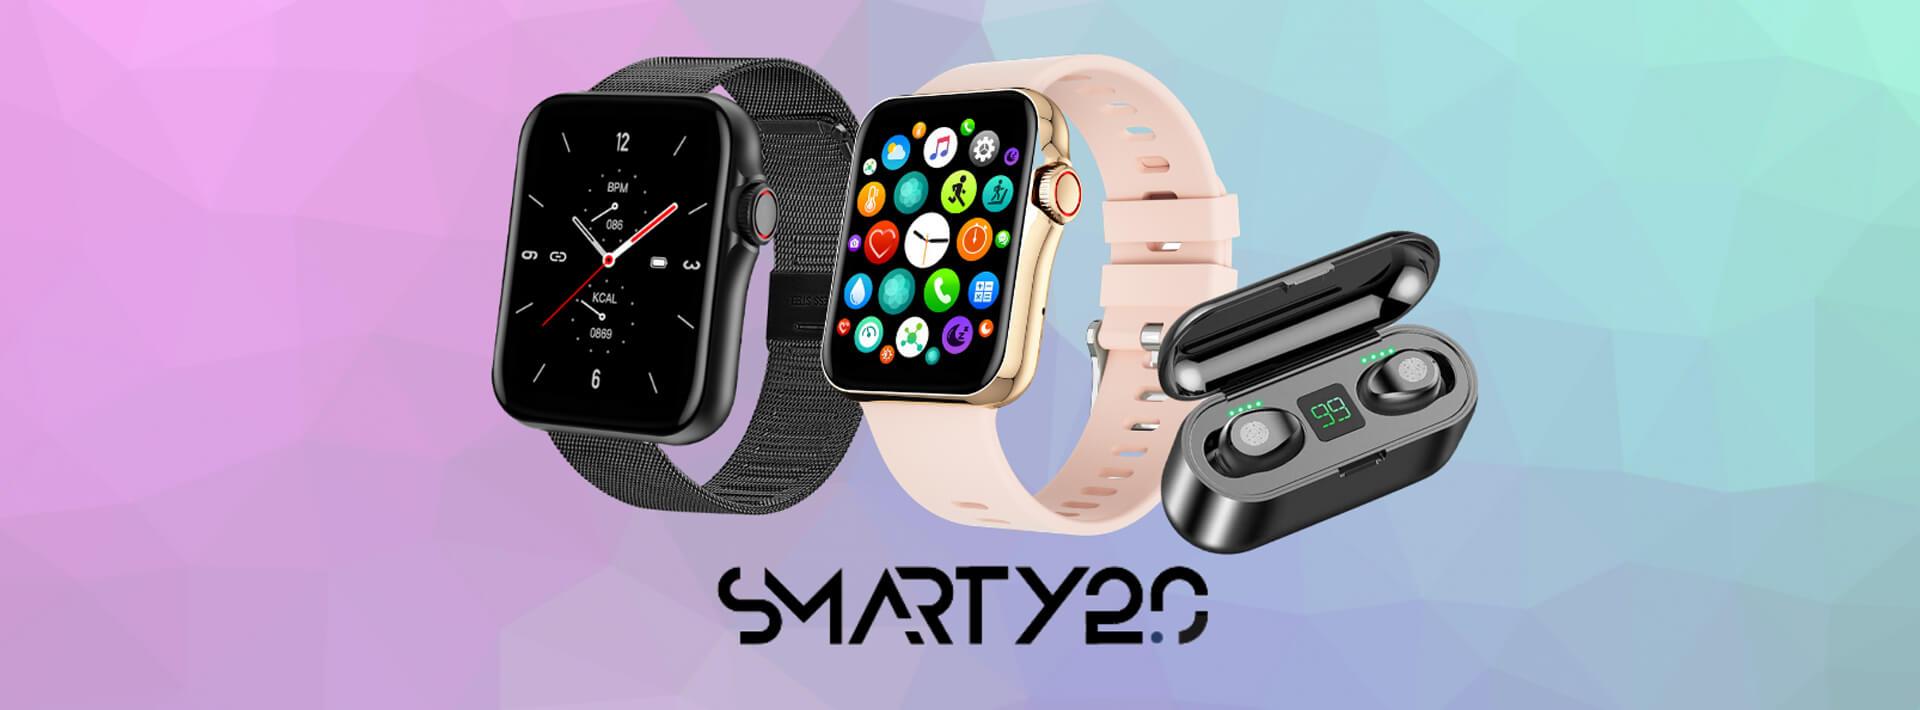 Smarty your Smartwatch. Orologi smartwatch Bellipario Gioielleria.